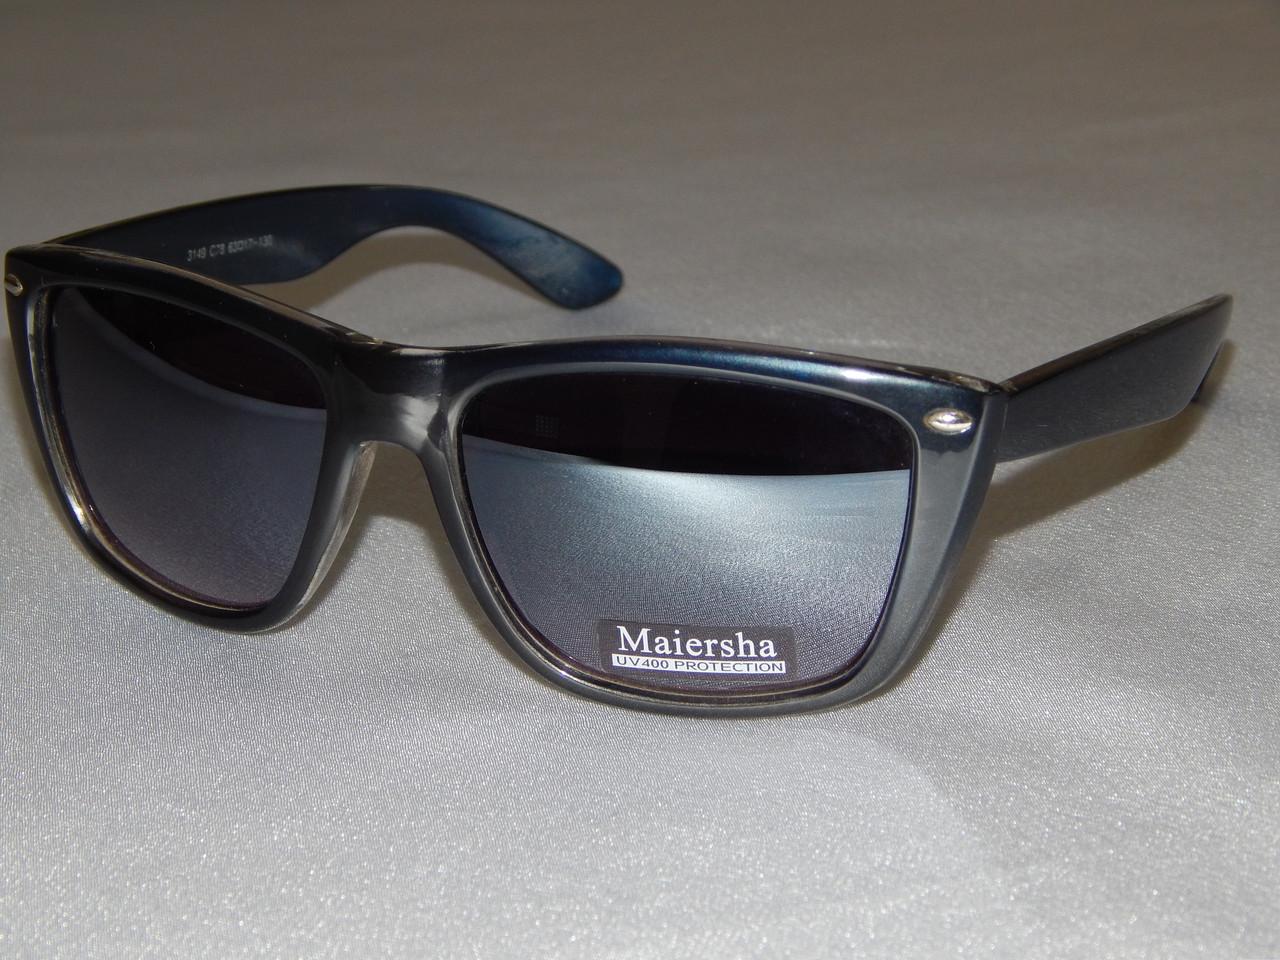 76e725ef332d Солнцезащитные очки, Maiersha темно - синие 760130 -